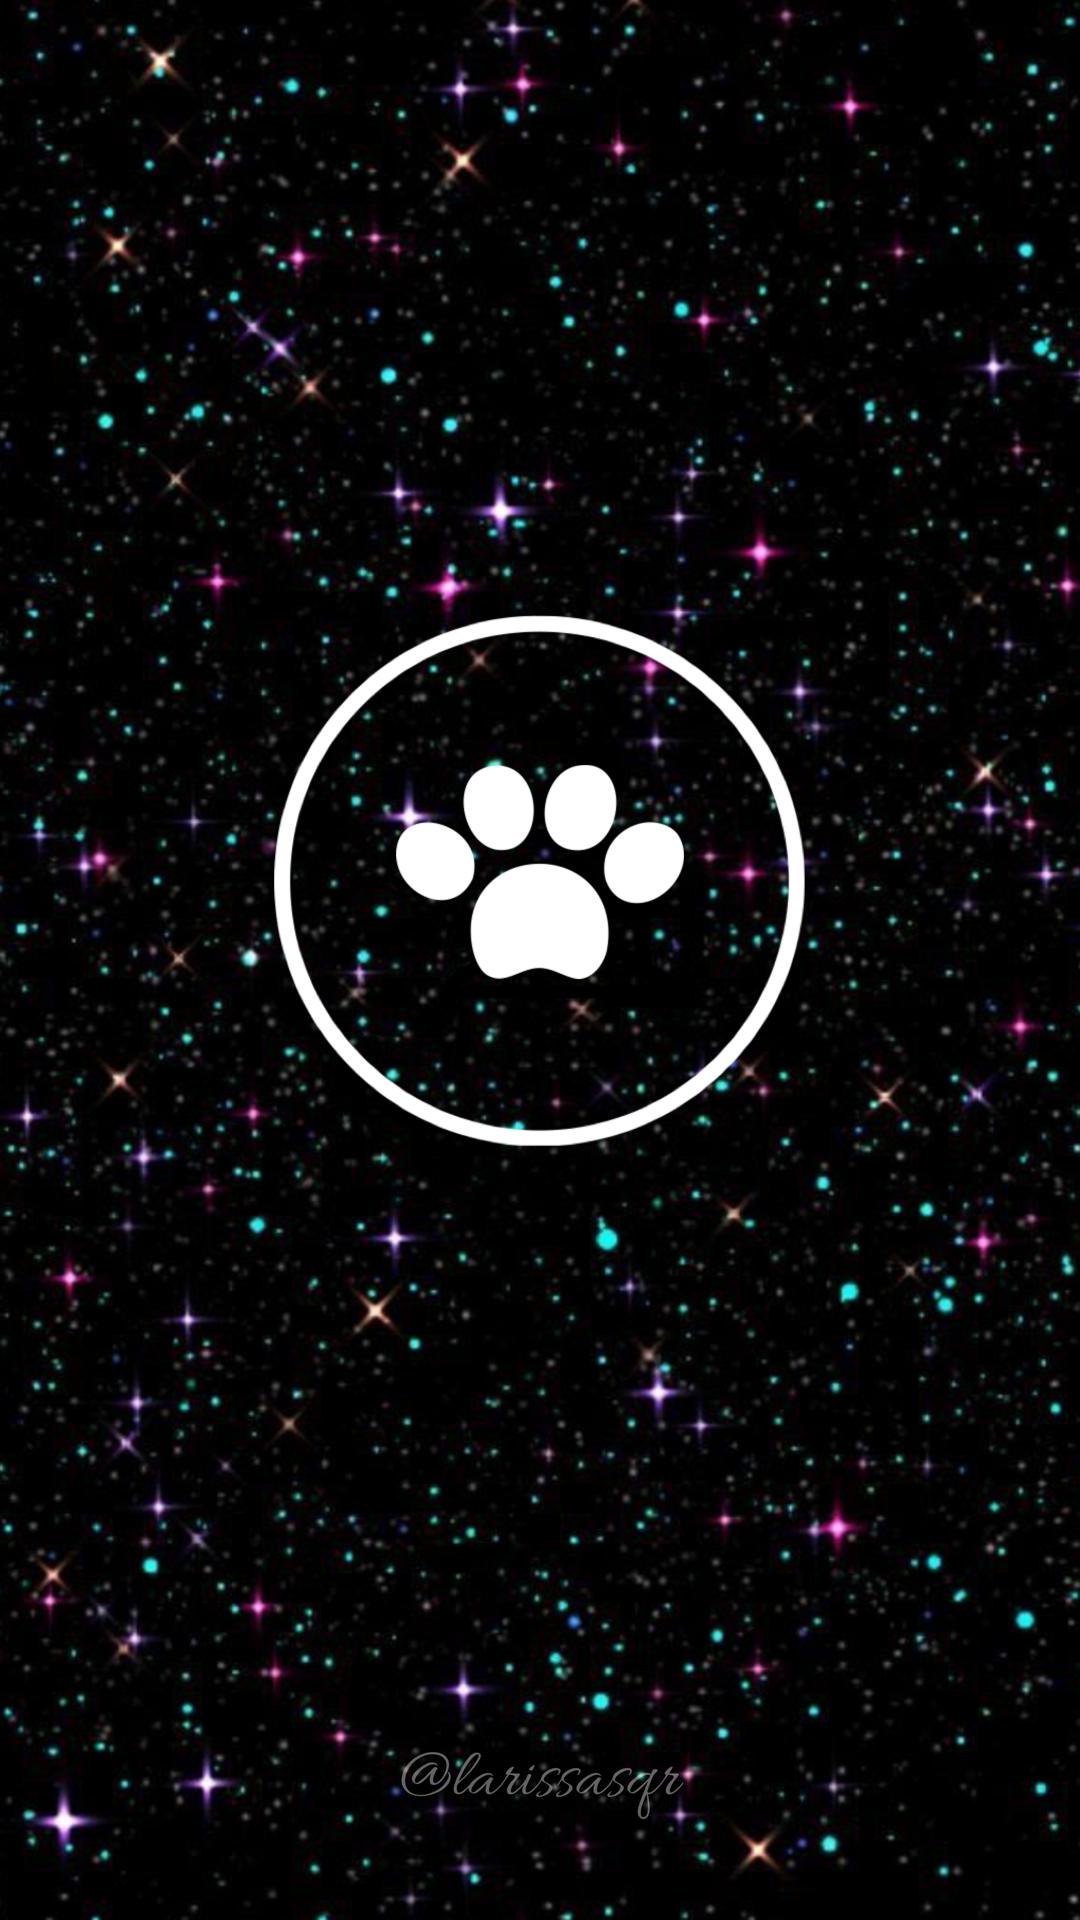 dog capadedestaques imagens) Logotipo instagram